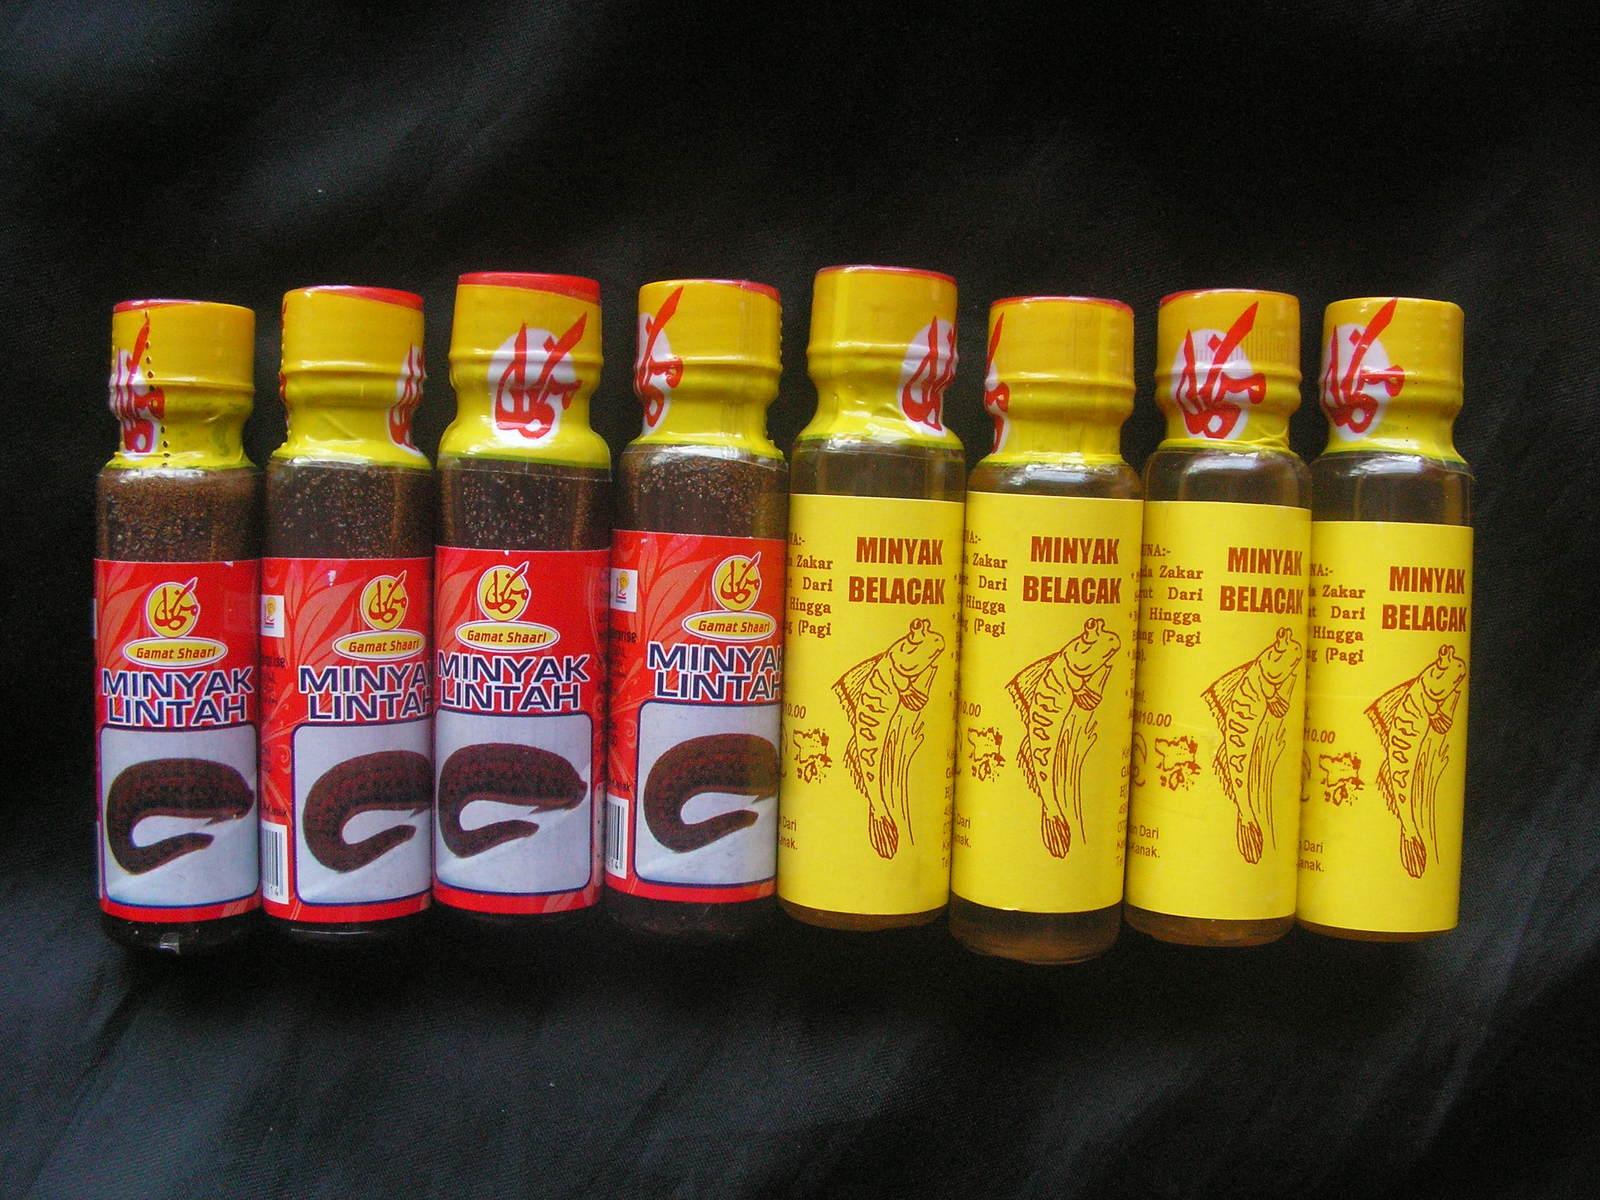 trial pack 4x20ml leech oil 4x27ml mudskipper oil